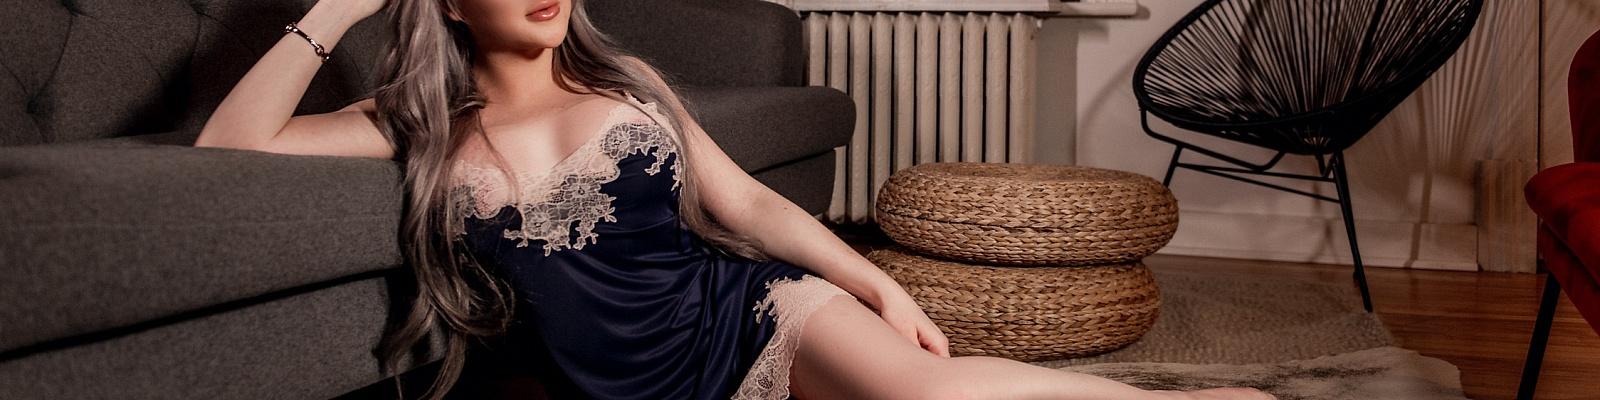 Karina Valentina Escort